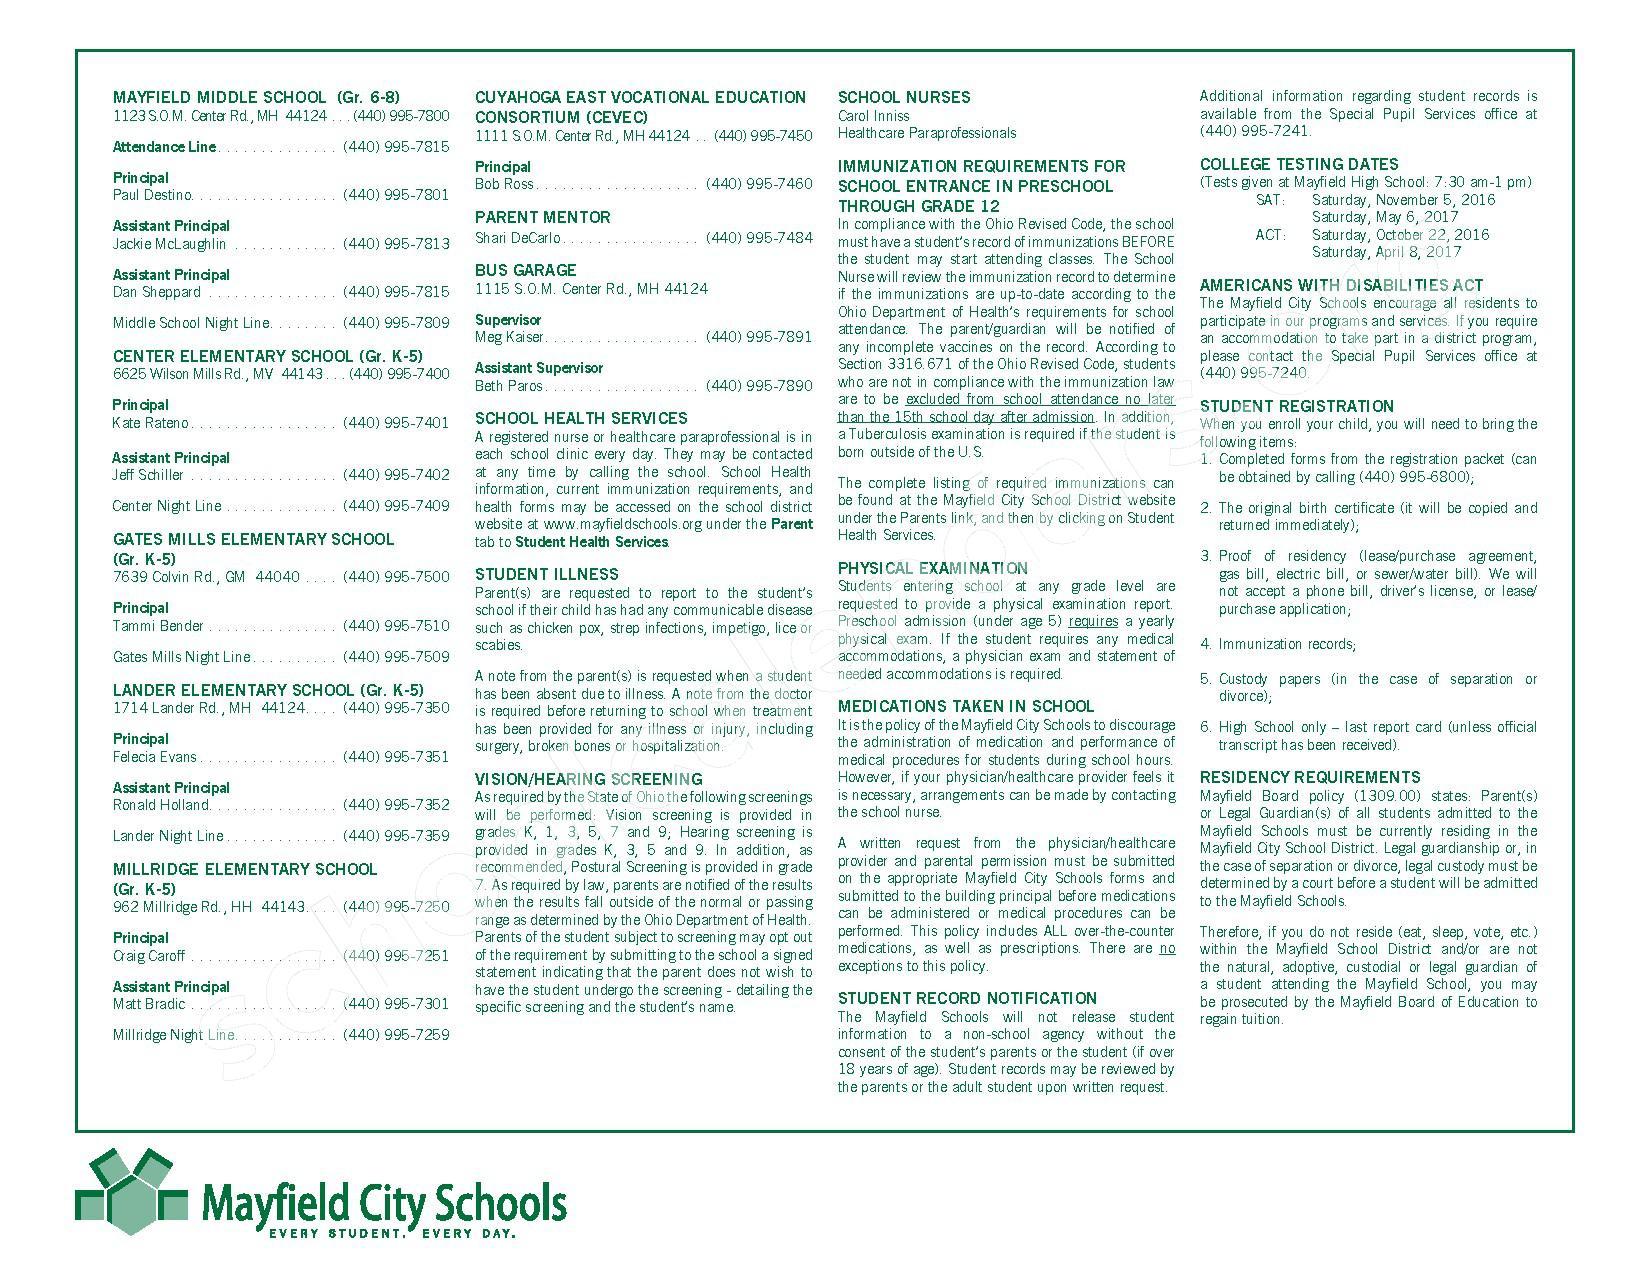 2016 - 2017 Mayfield Activities Calendar – Mayfield City Schools – page 3